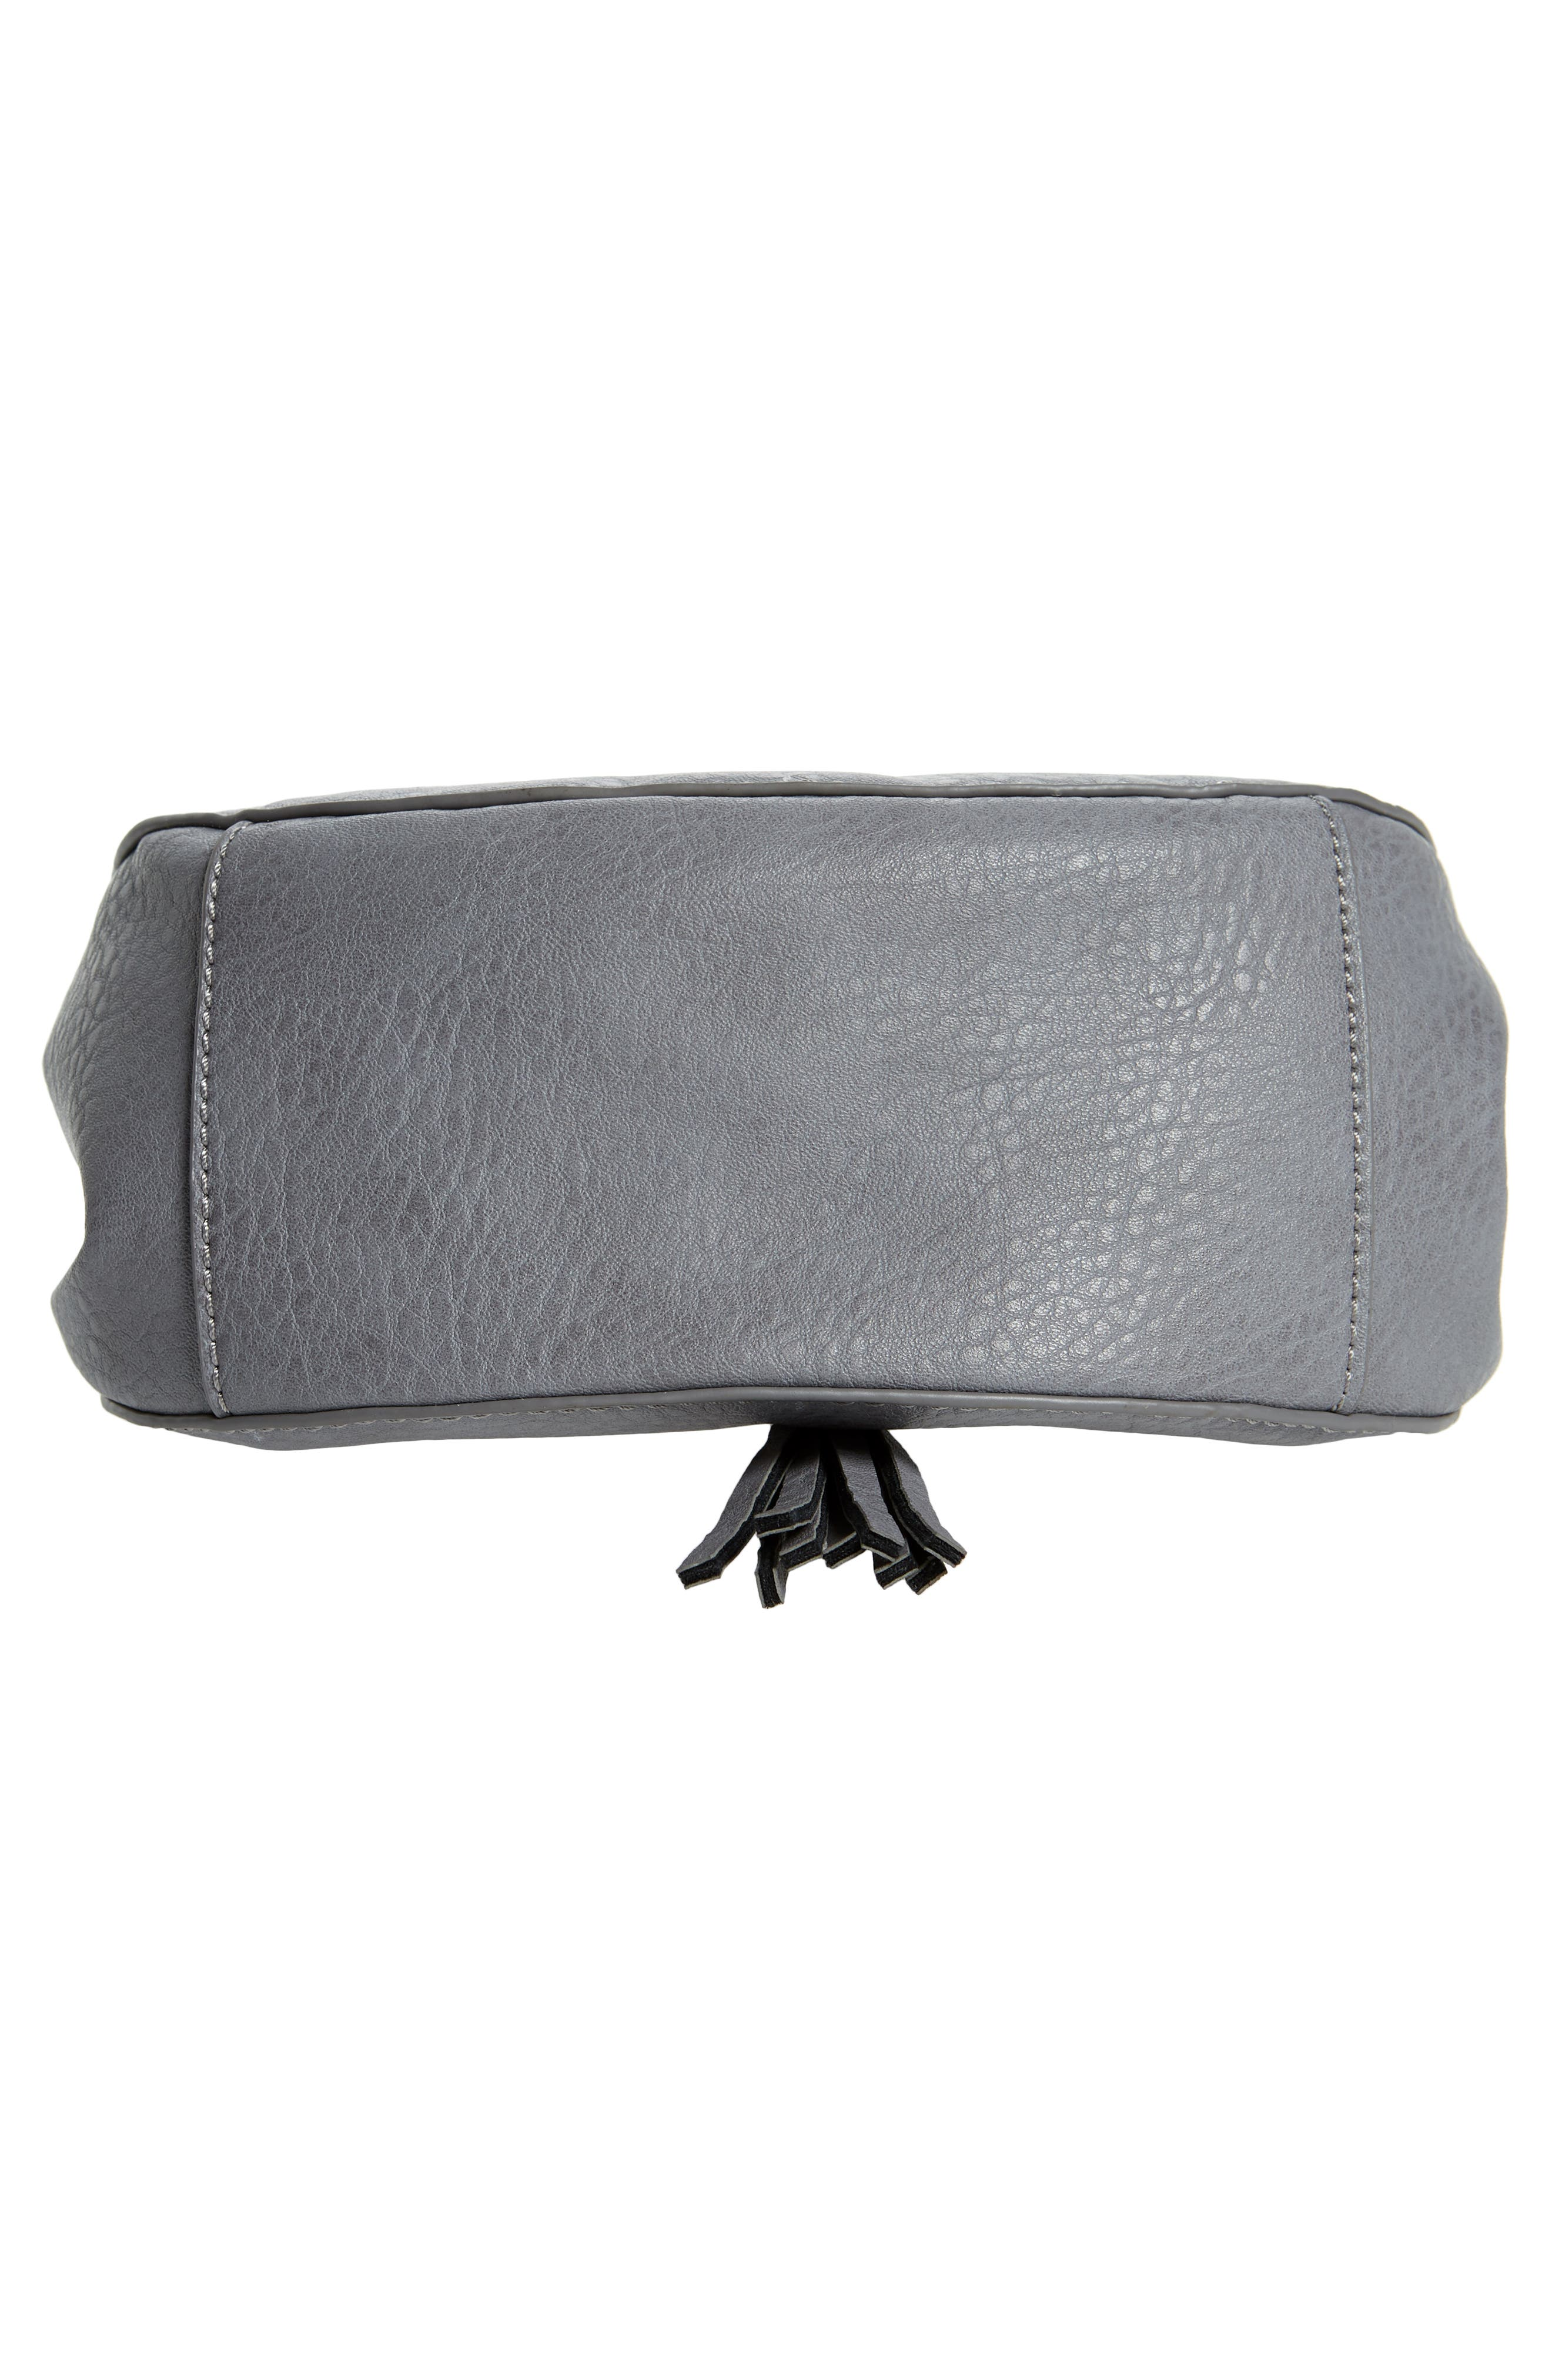 Tassel Faux Leather Crossbody Saddle Bag,                             Alternate thumbnail 6, color,                             Grey